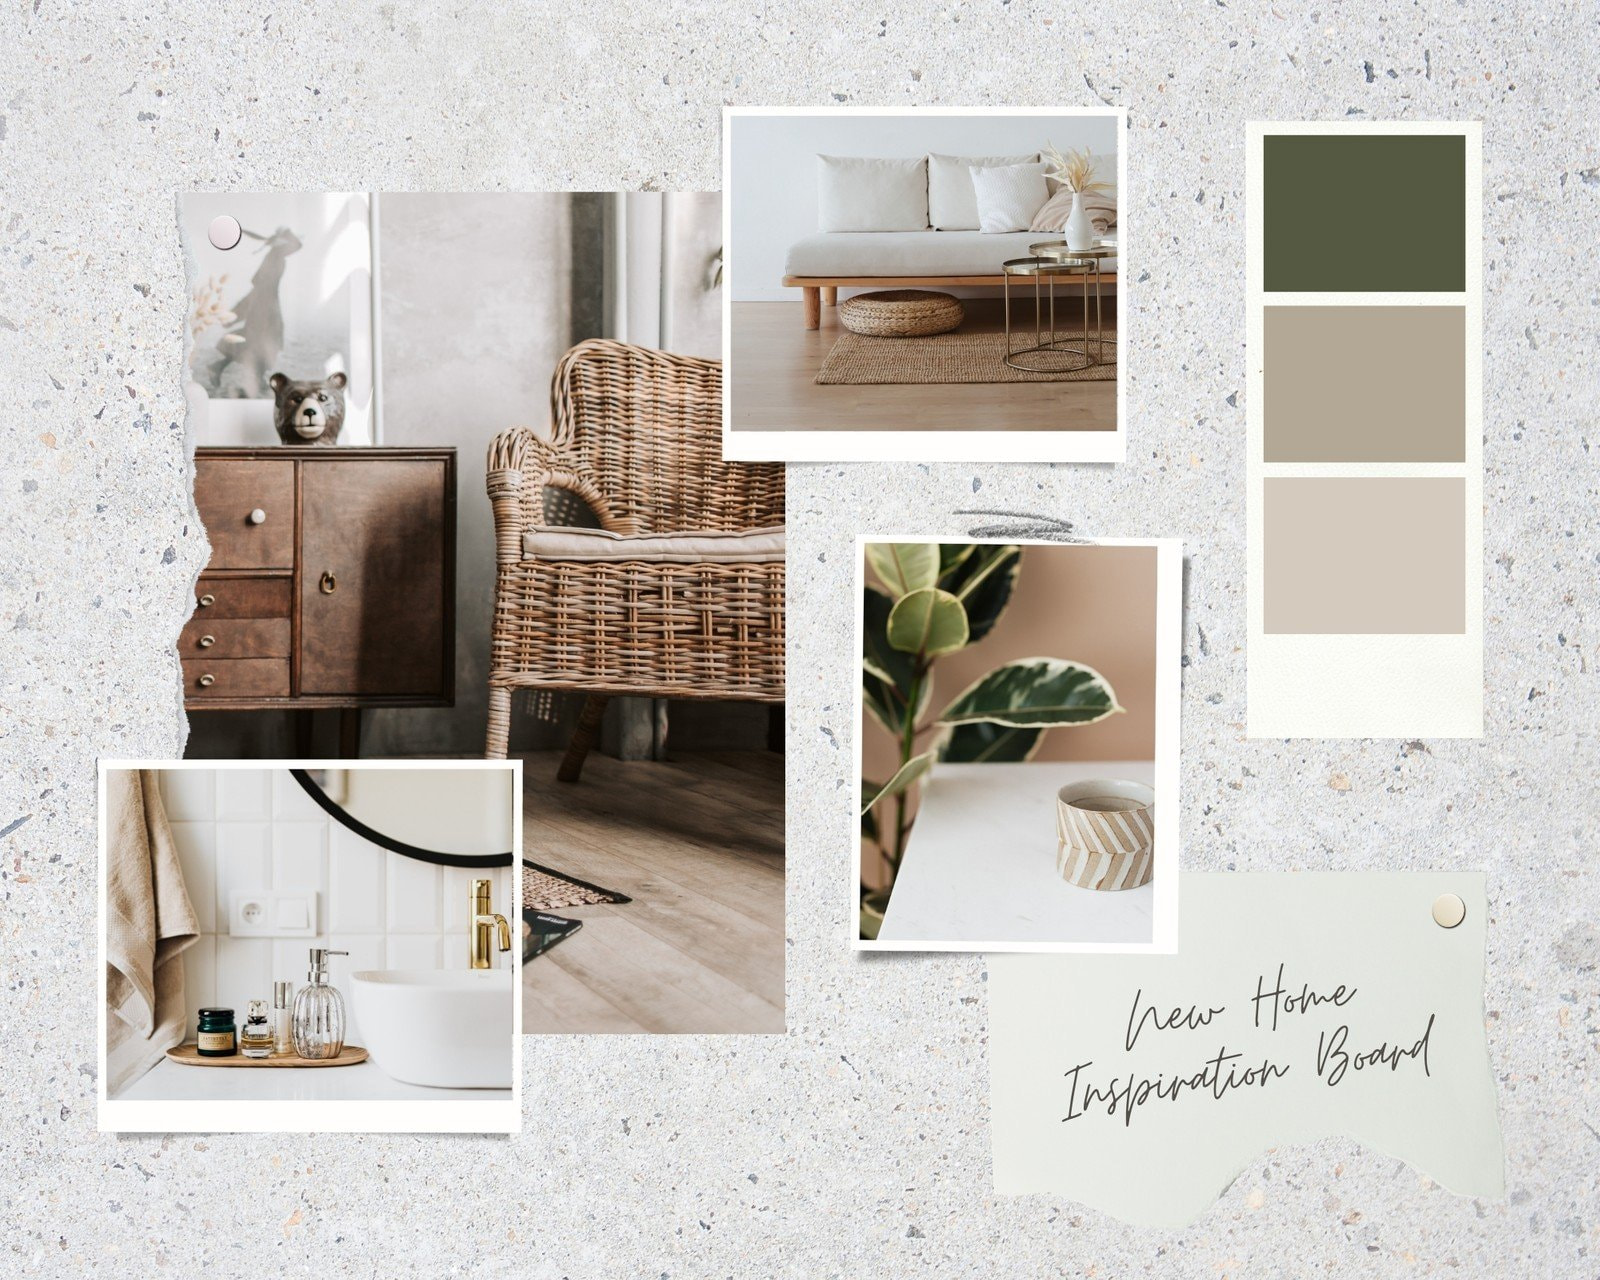 Green and Brown Realistic Interior Design Moodboard Photo Collage